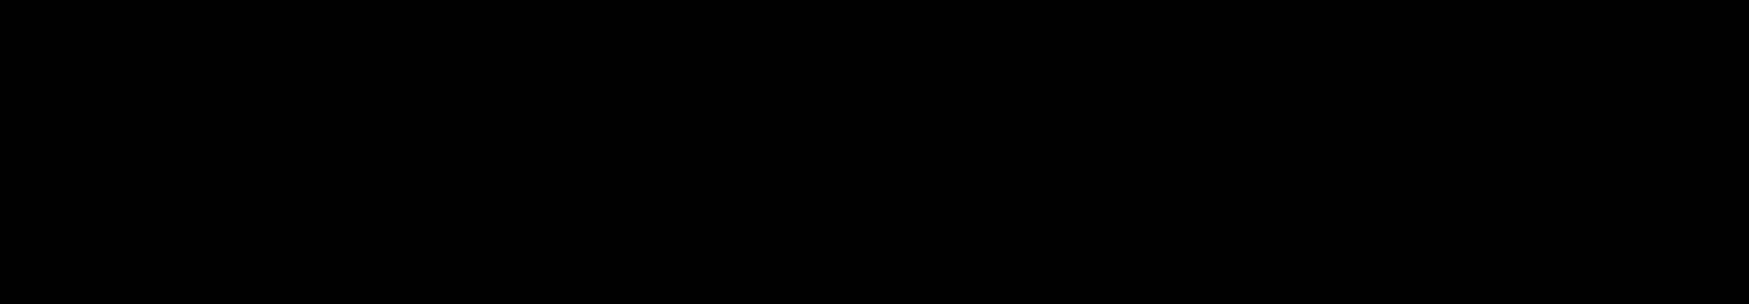 Neonrose_Studios_version1_font.png